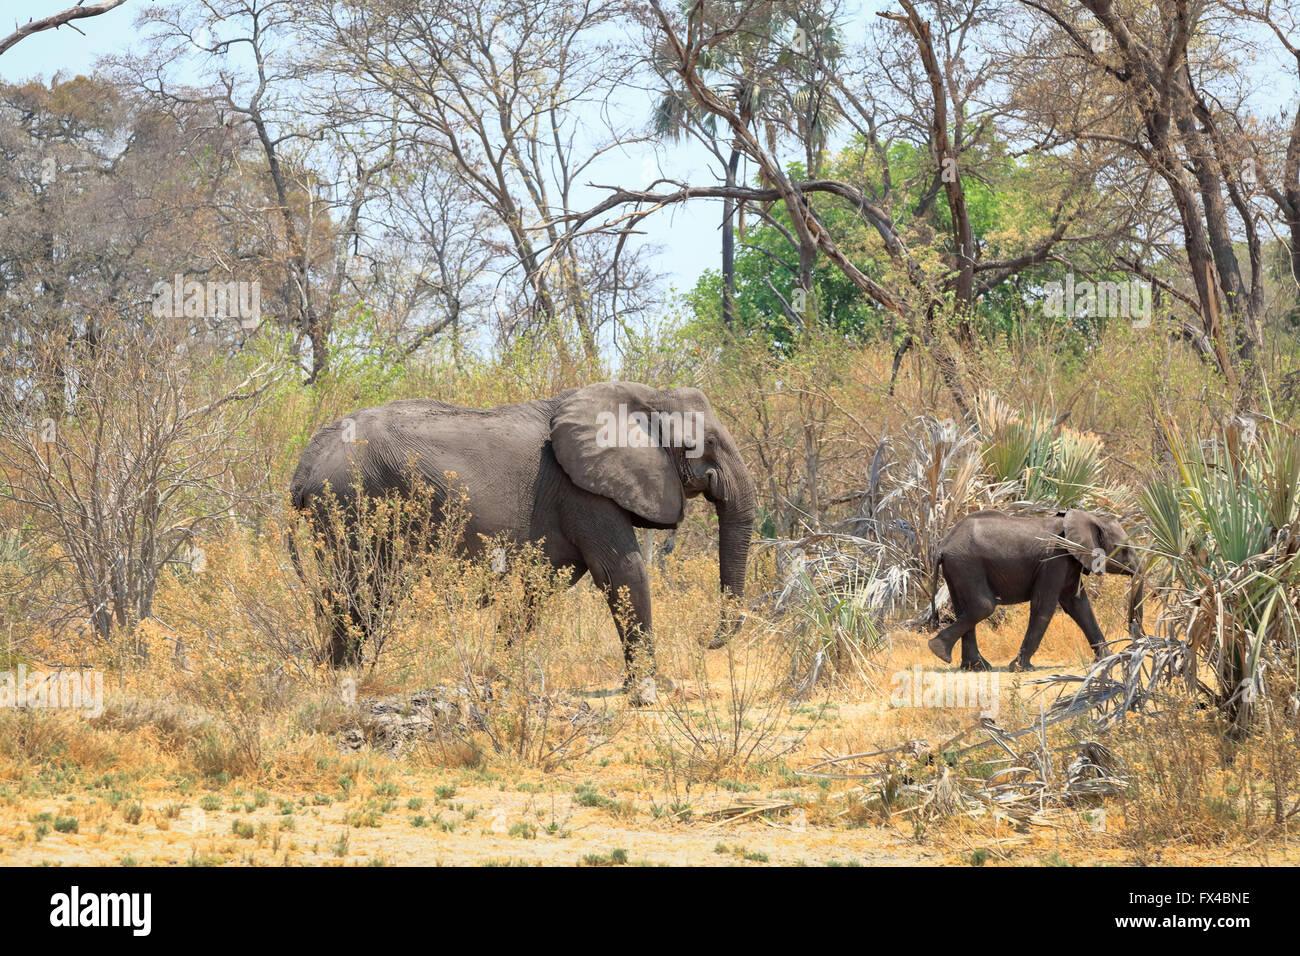 Afican bush elephant (Loxodonta africana) and baby, walking through woodland in the Okavango Delta, Botswana - Stock Image